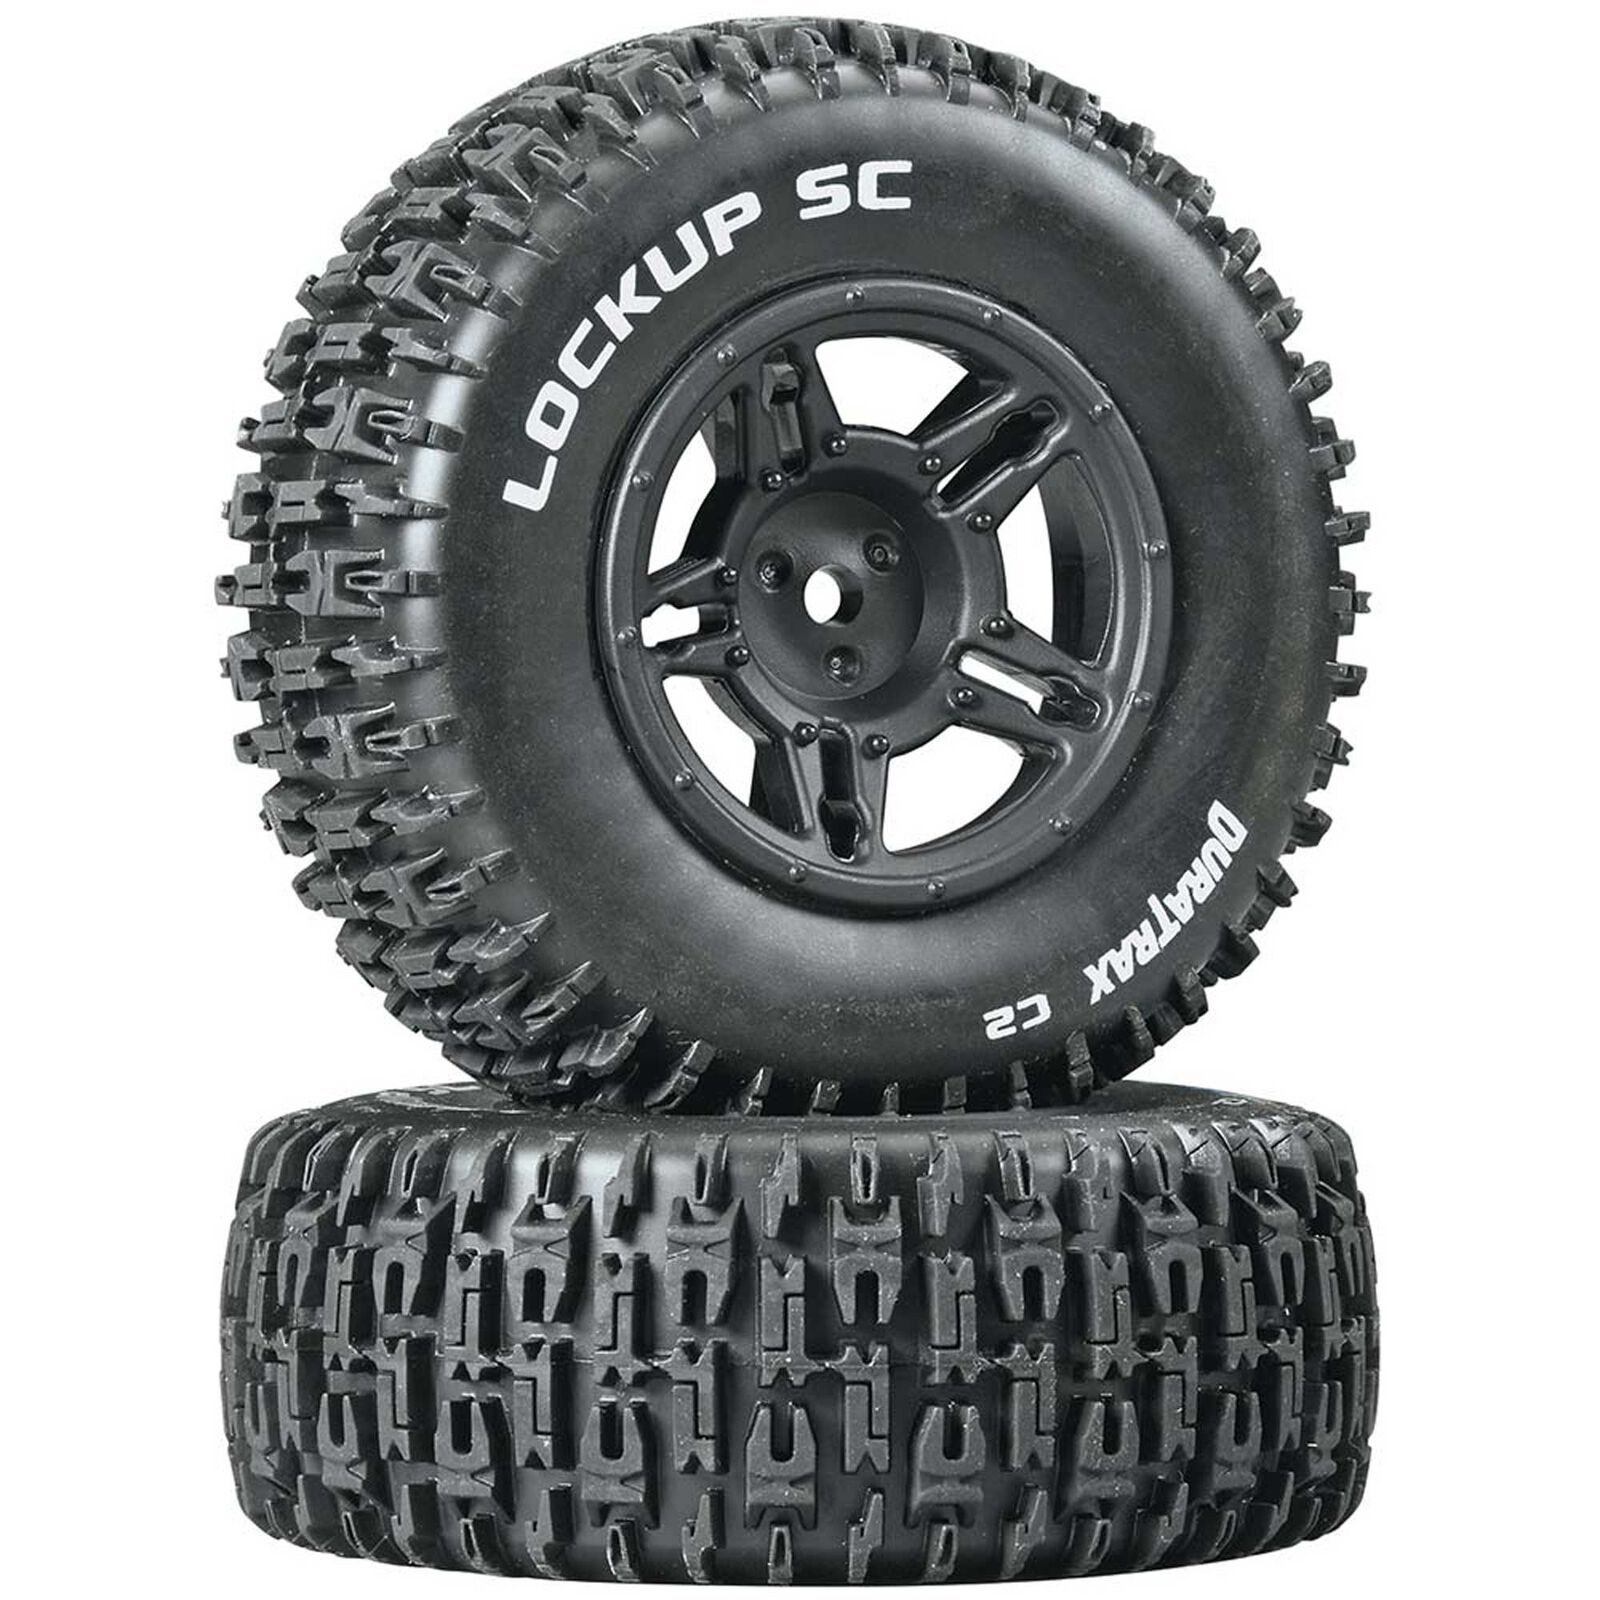 Lockup SC Tire C2 Mounted Black Rear: Slash (2)